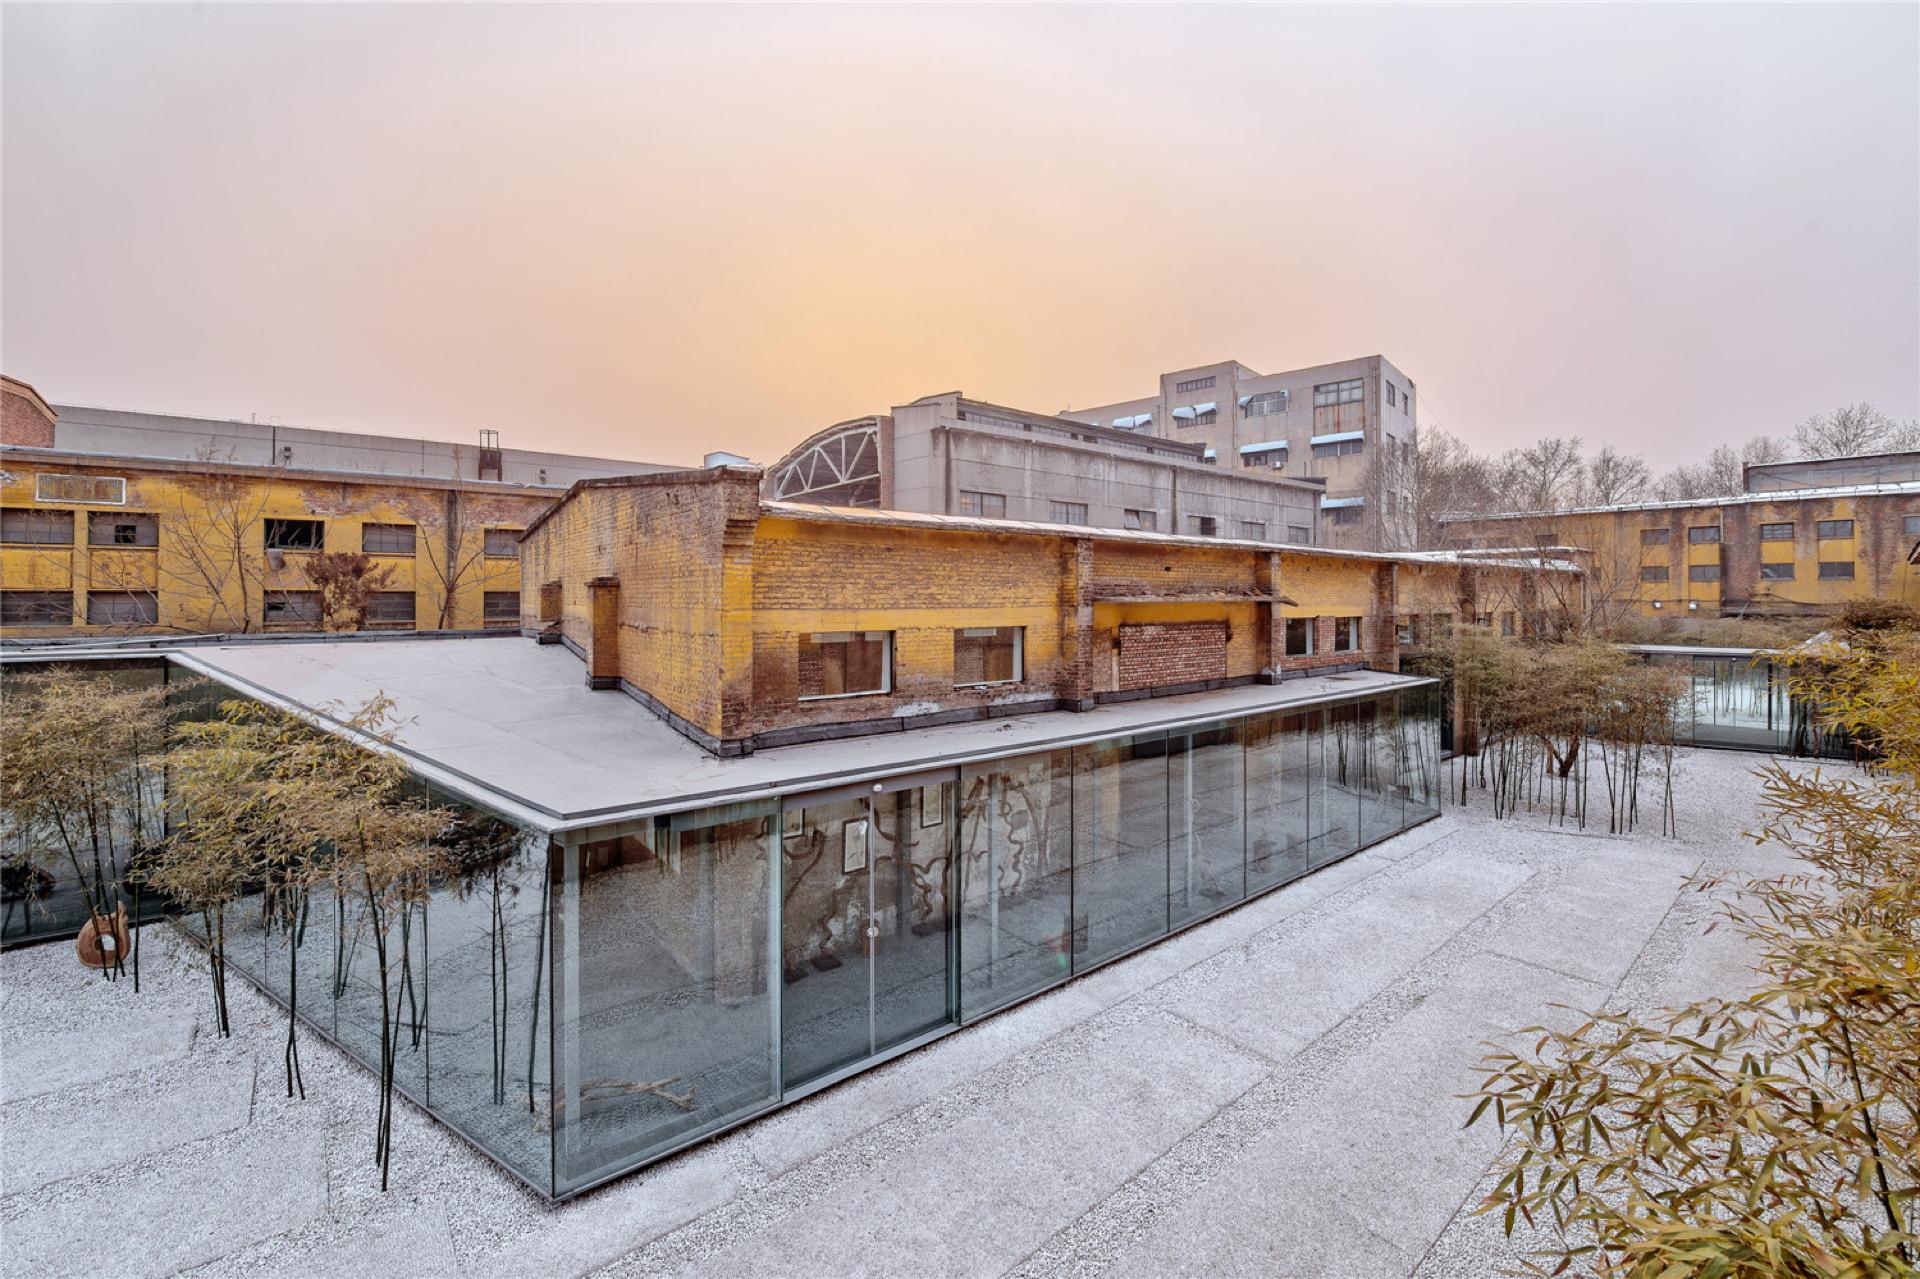 Archstudio: The Great Wall Museum of Fine Art in Zi Bo (China)